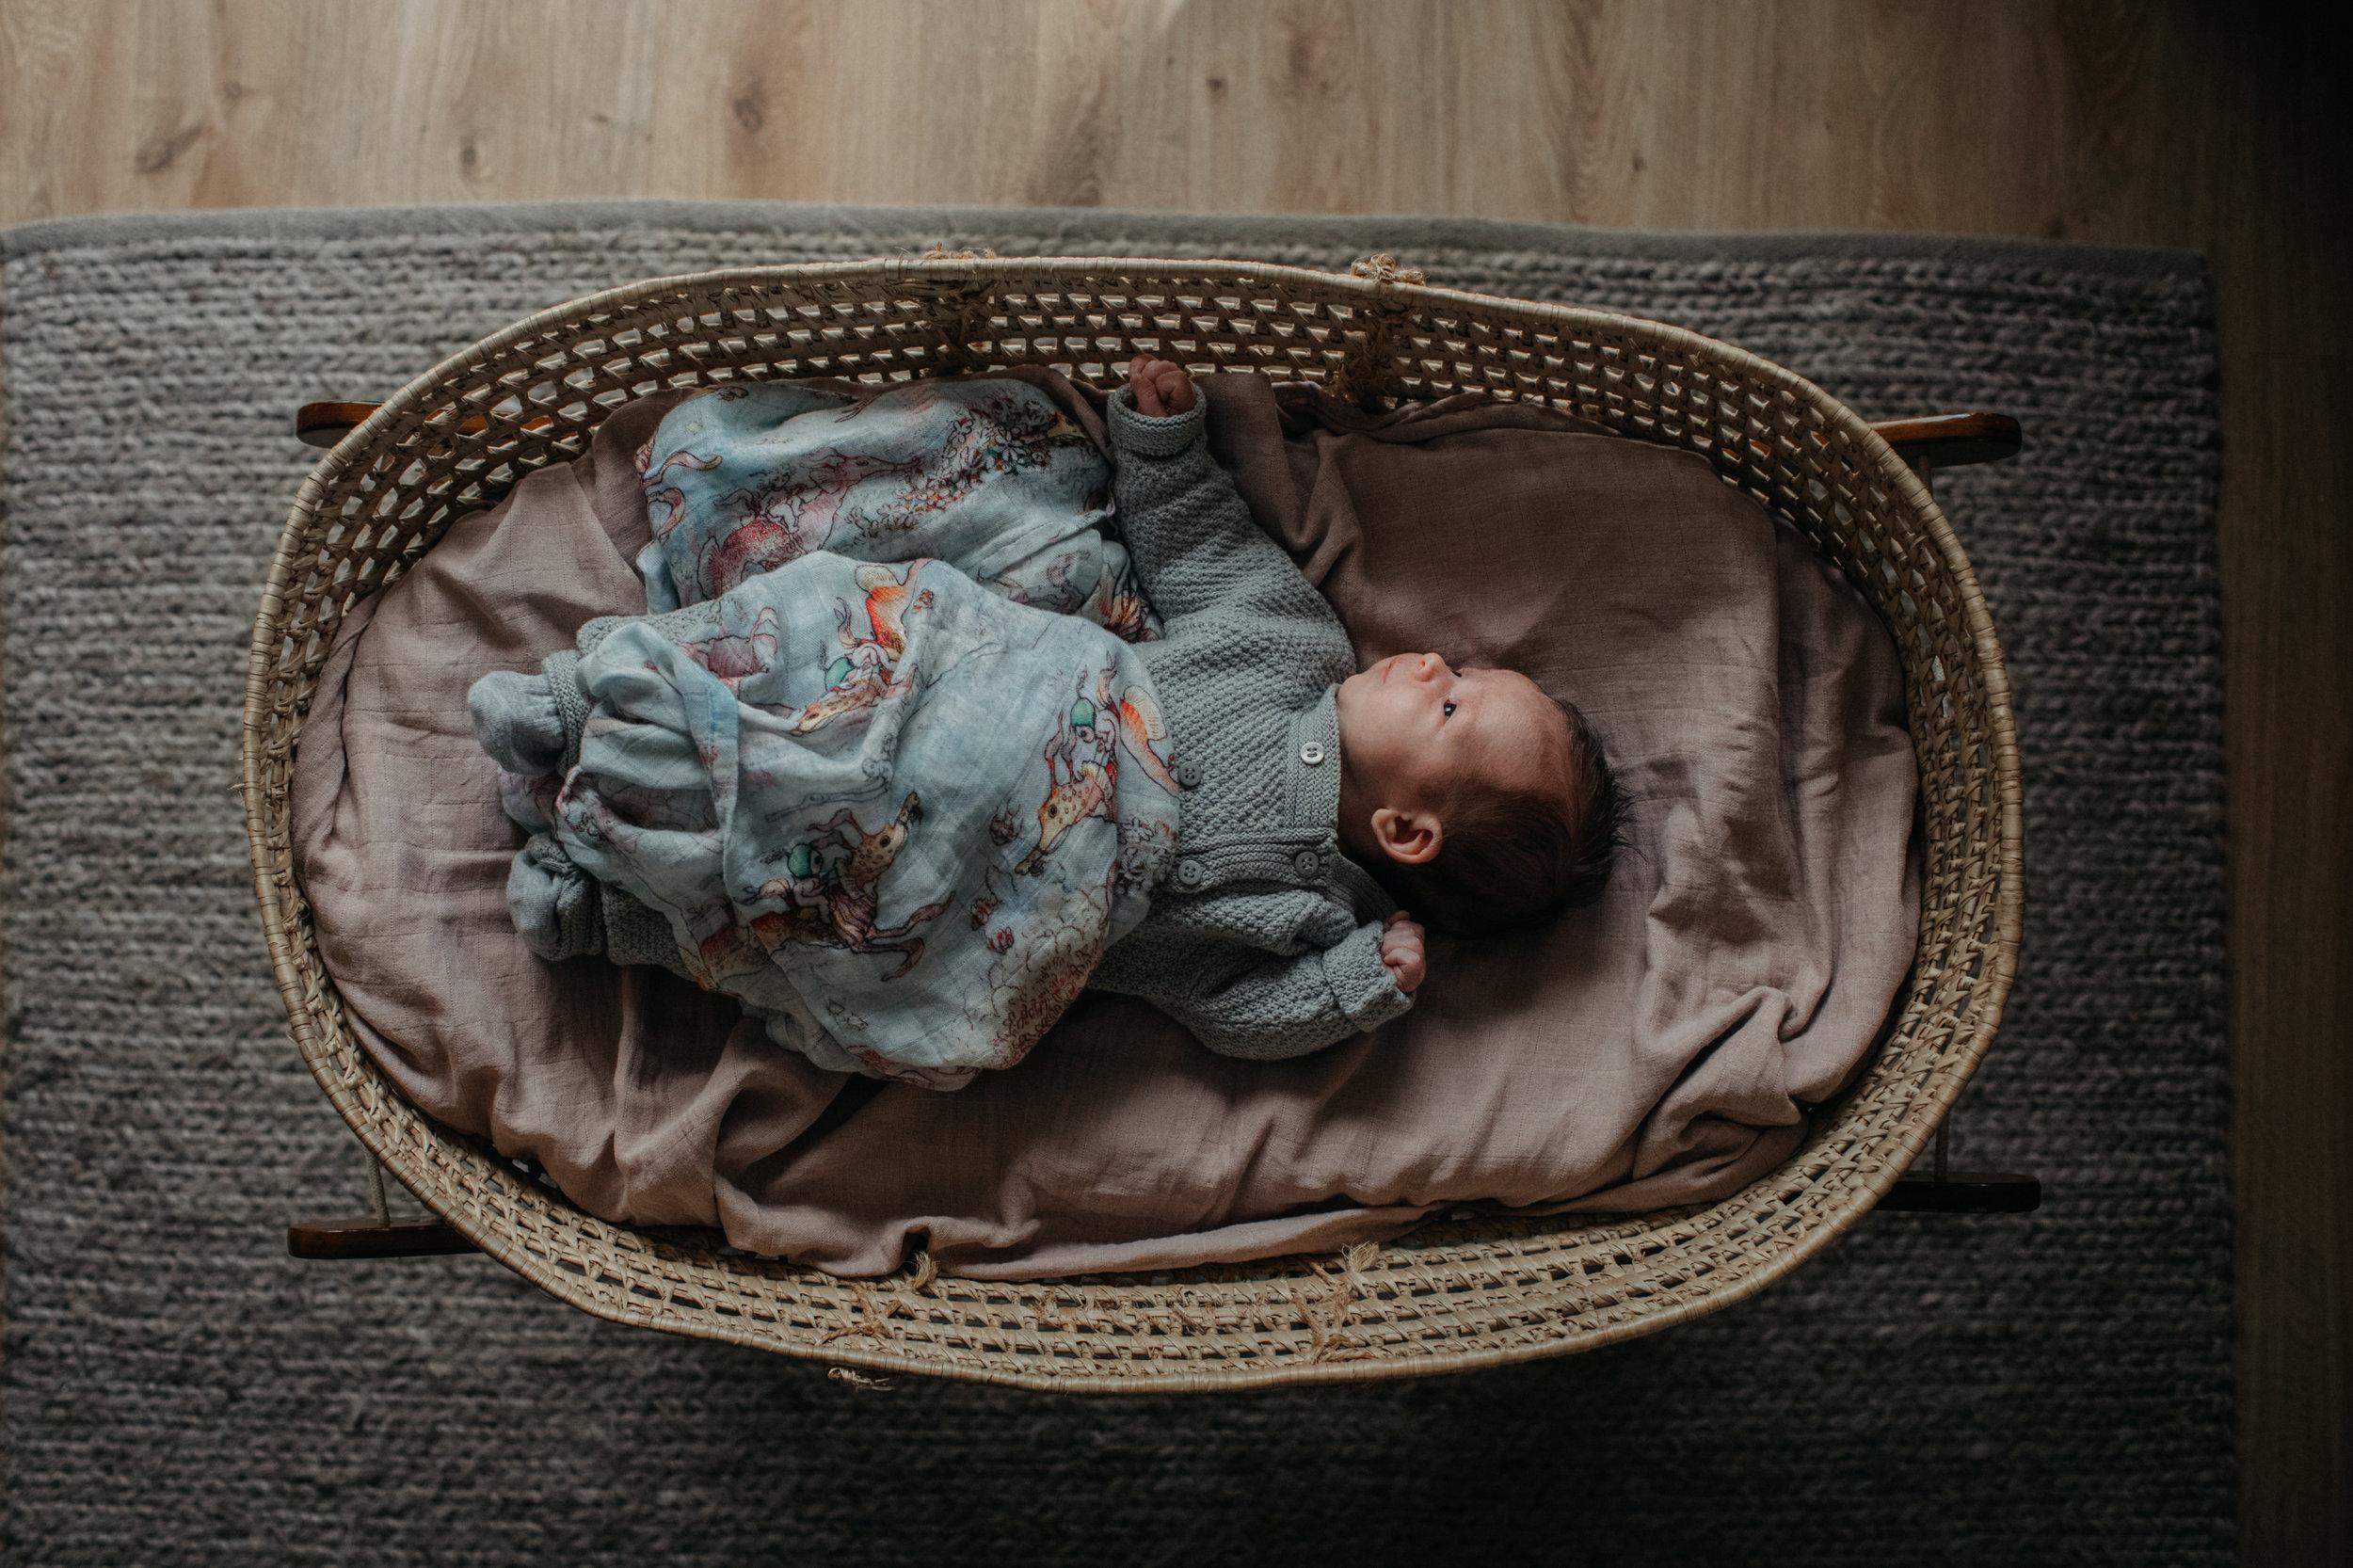 sheridan_nilsson_newborn_fresh_48_Birth_Photographer_sydney_photography.-1894.jpg